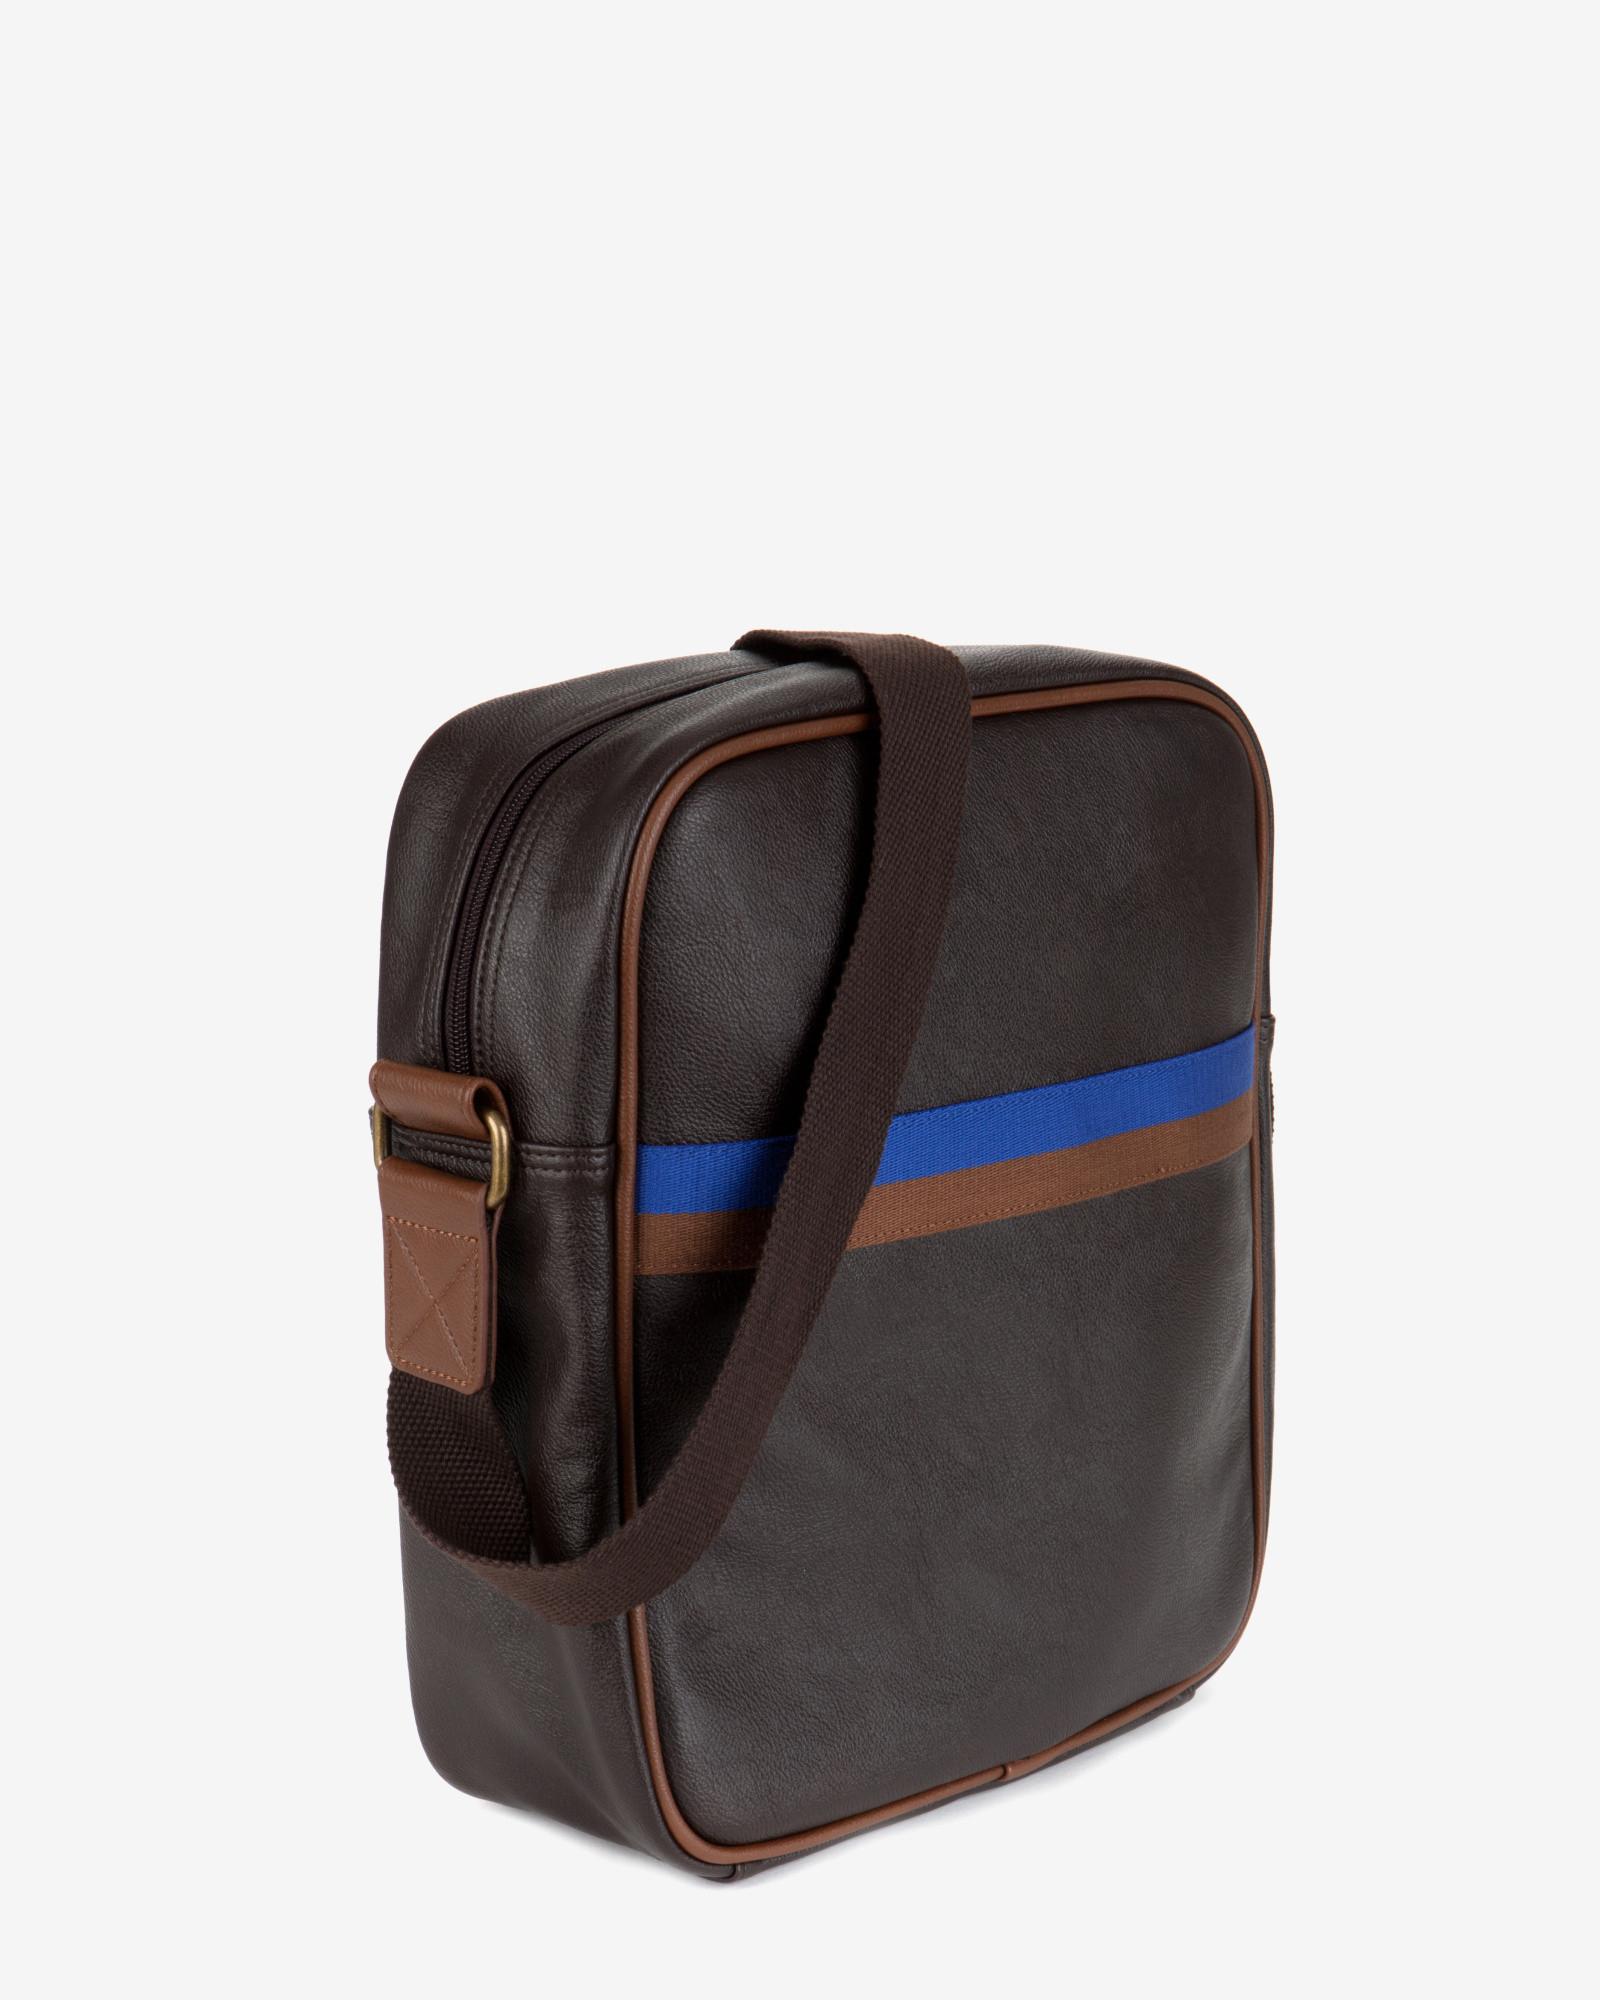 Ted Baker Cross Body Flight Bag in Chocolate (Brown) for Men